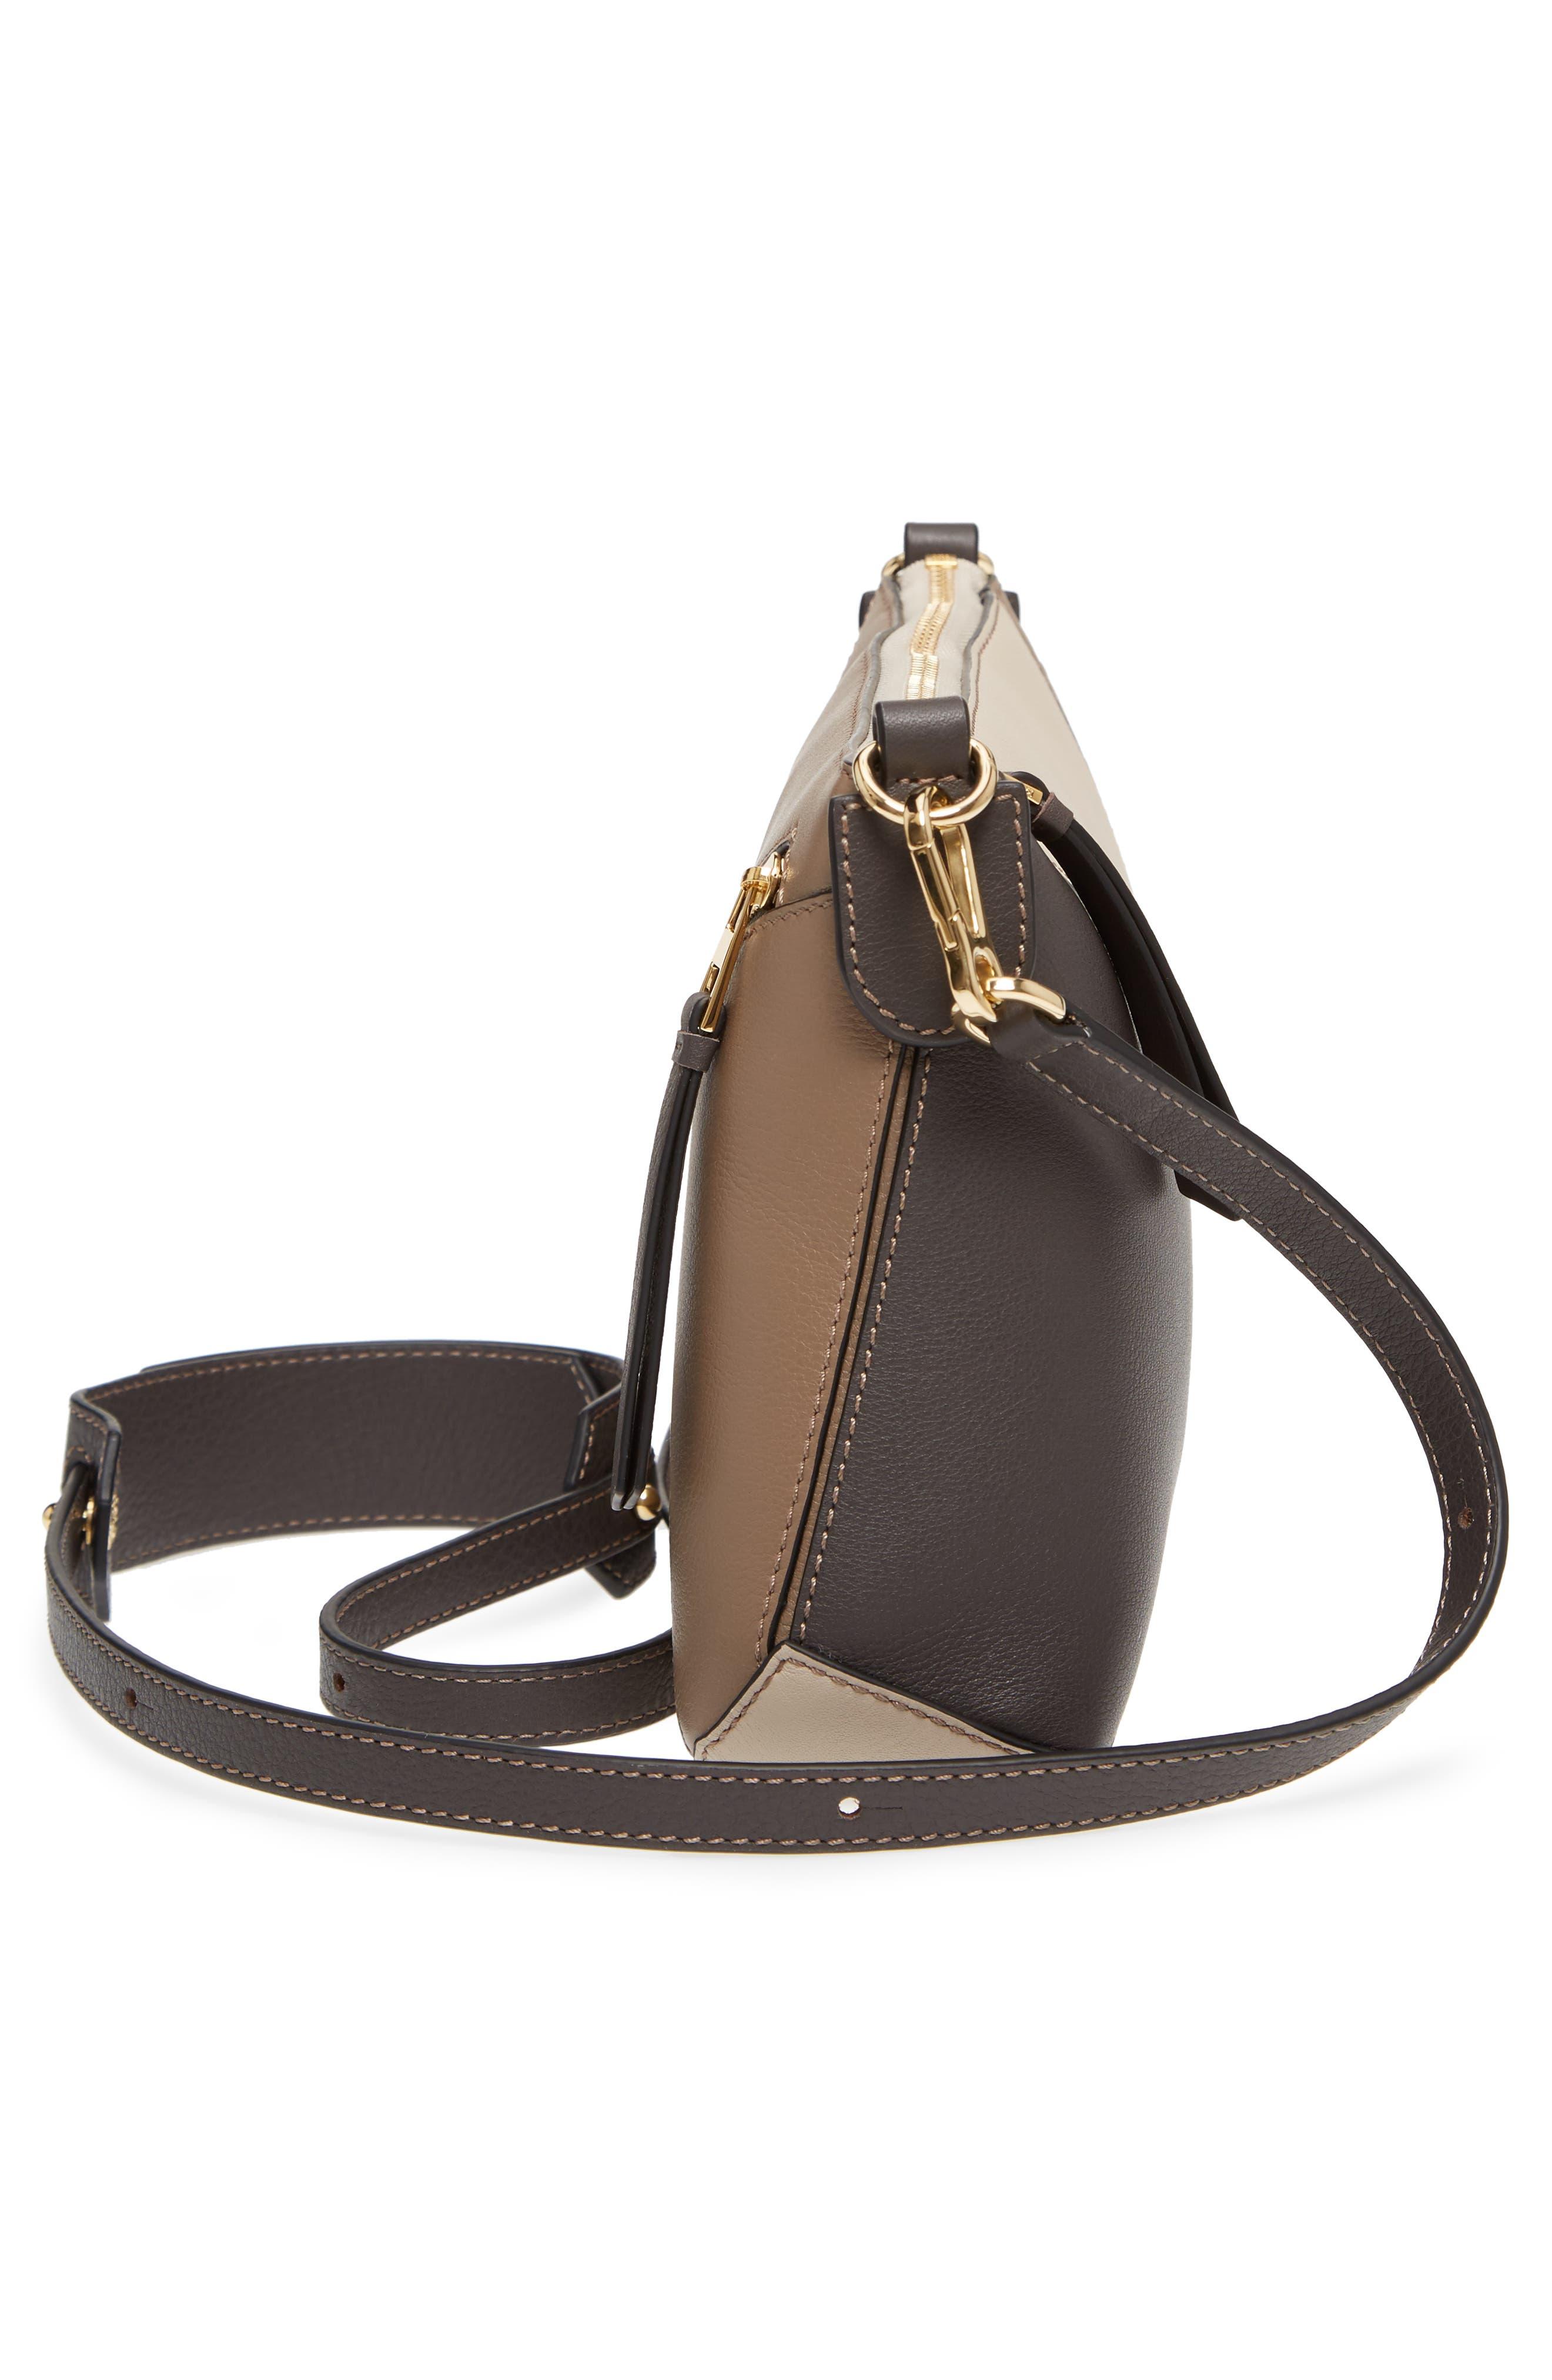 Mini Puzzle Calfskin Leather Crossbody Bag,                             Alternate thumbnail 5, color,                             DARK TAUPE MULTITONE